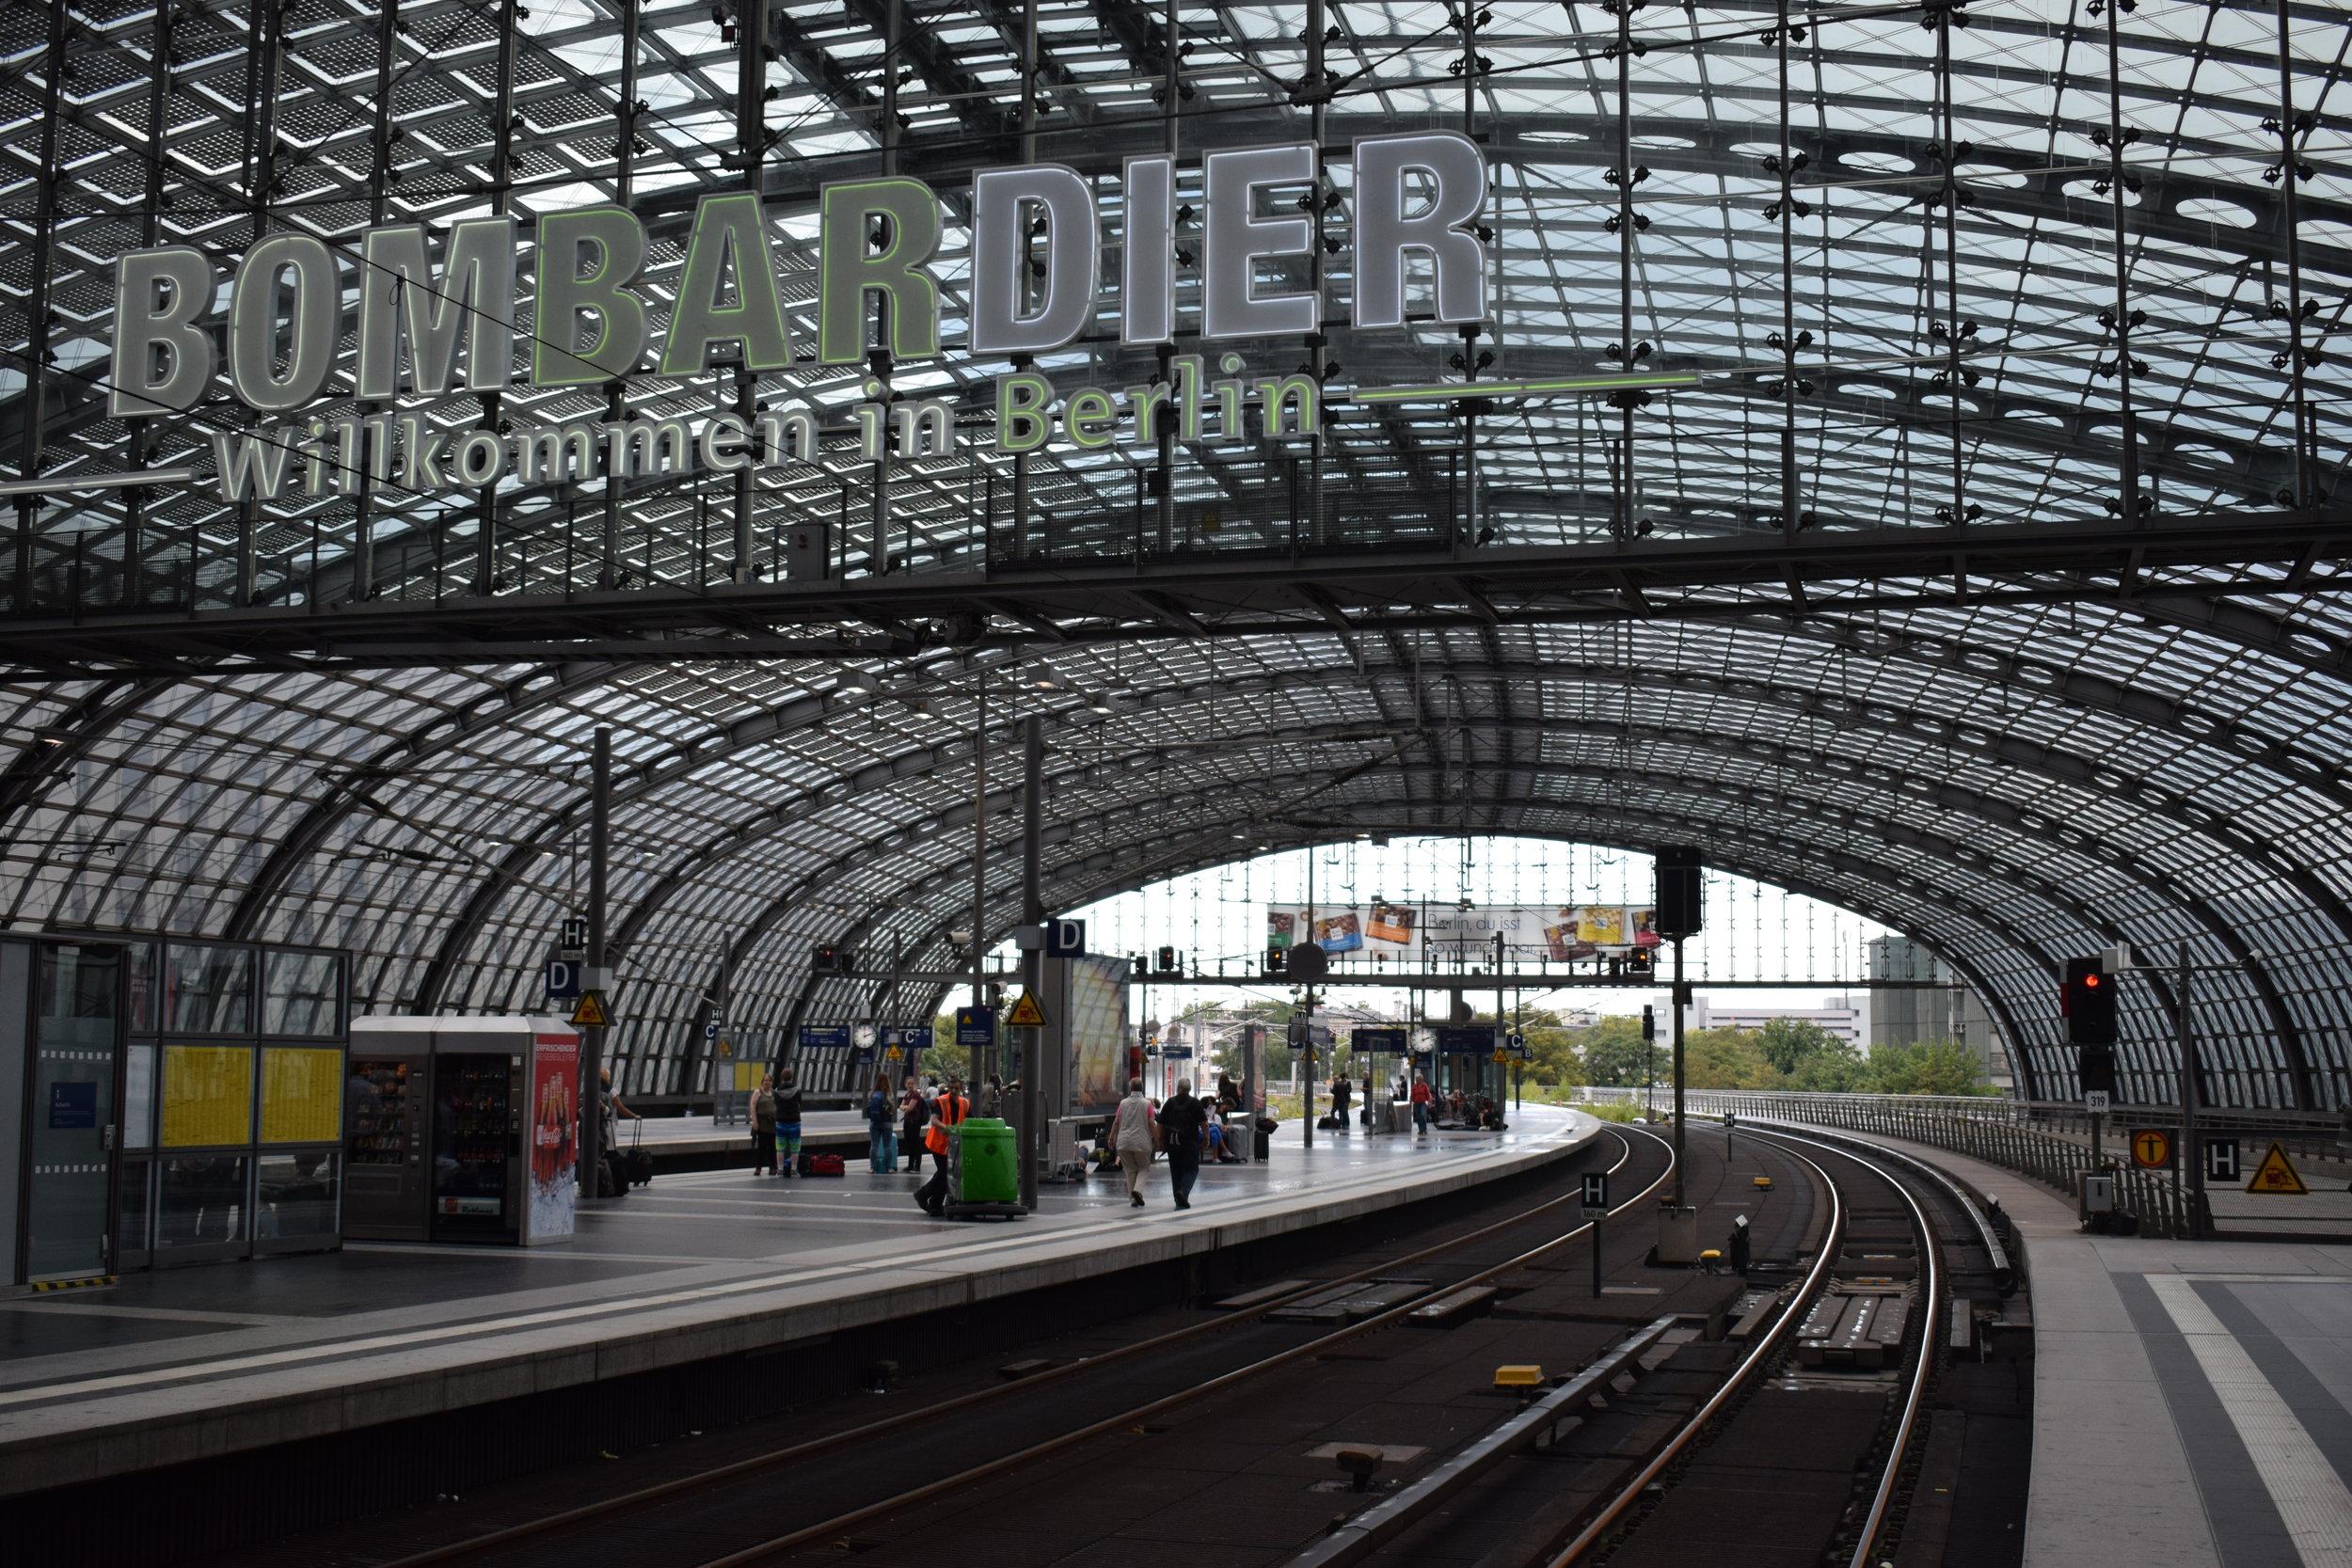 Berlin Hauptbahnhof - one of the city's main gateways.